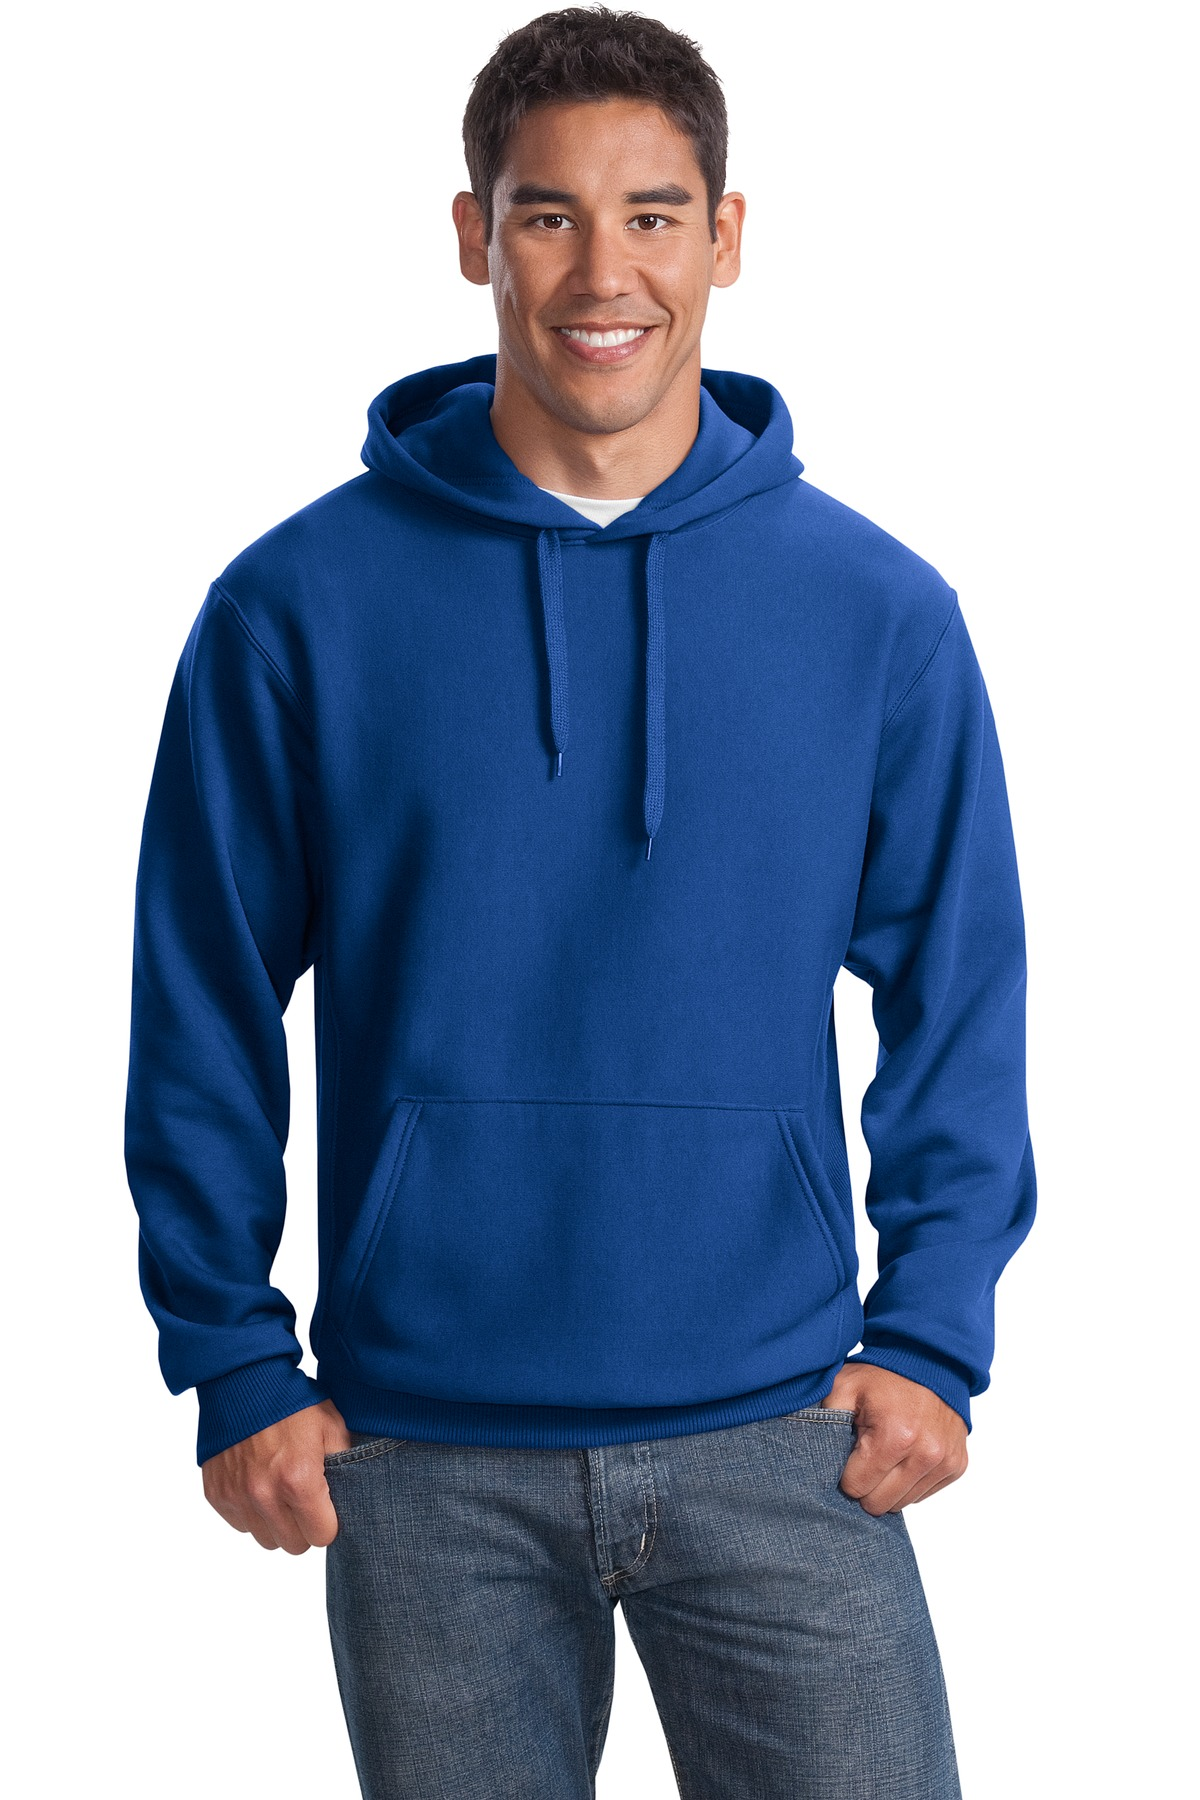 Sport Tek Sport Tek Men S Super Heavyweight Pullover Hooded Sweatshirt F281 Walmart Com Walmart Com Kapüşonlu veya kapüşonsuz, düz, baskılı veya fermuarlı. sport tek sport tek men s super heavyweight pullover hooded sweatshirt f281 walmart com